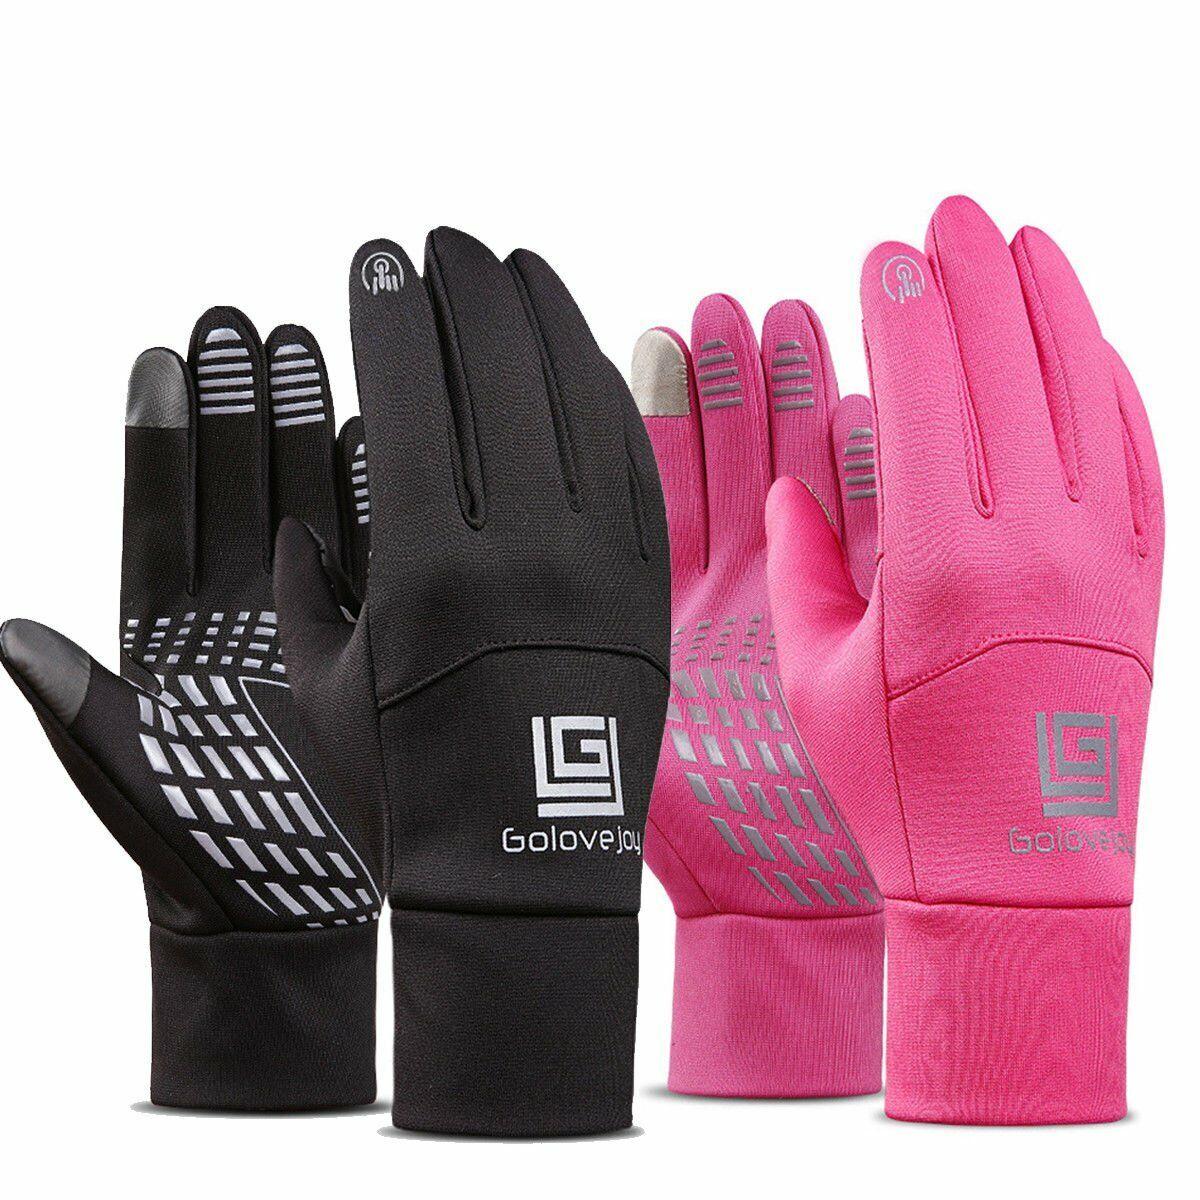 Sports Neoprene Windproof Touch Screen Thermal Gloves Mittens Winter Waterproof